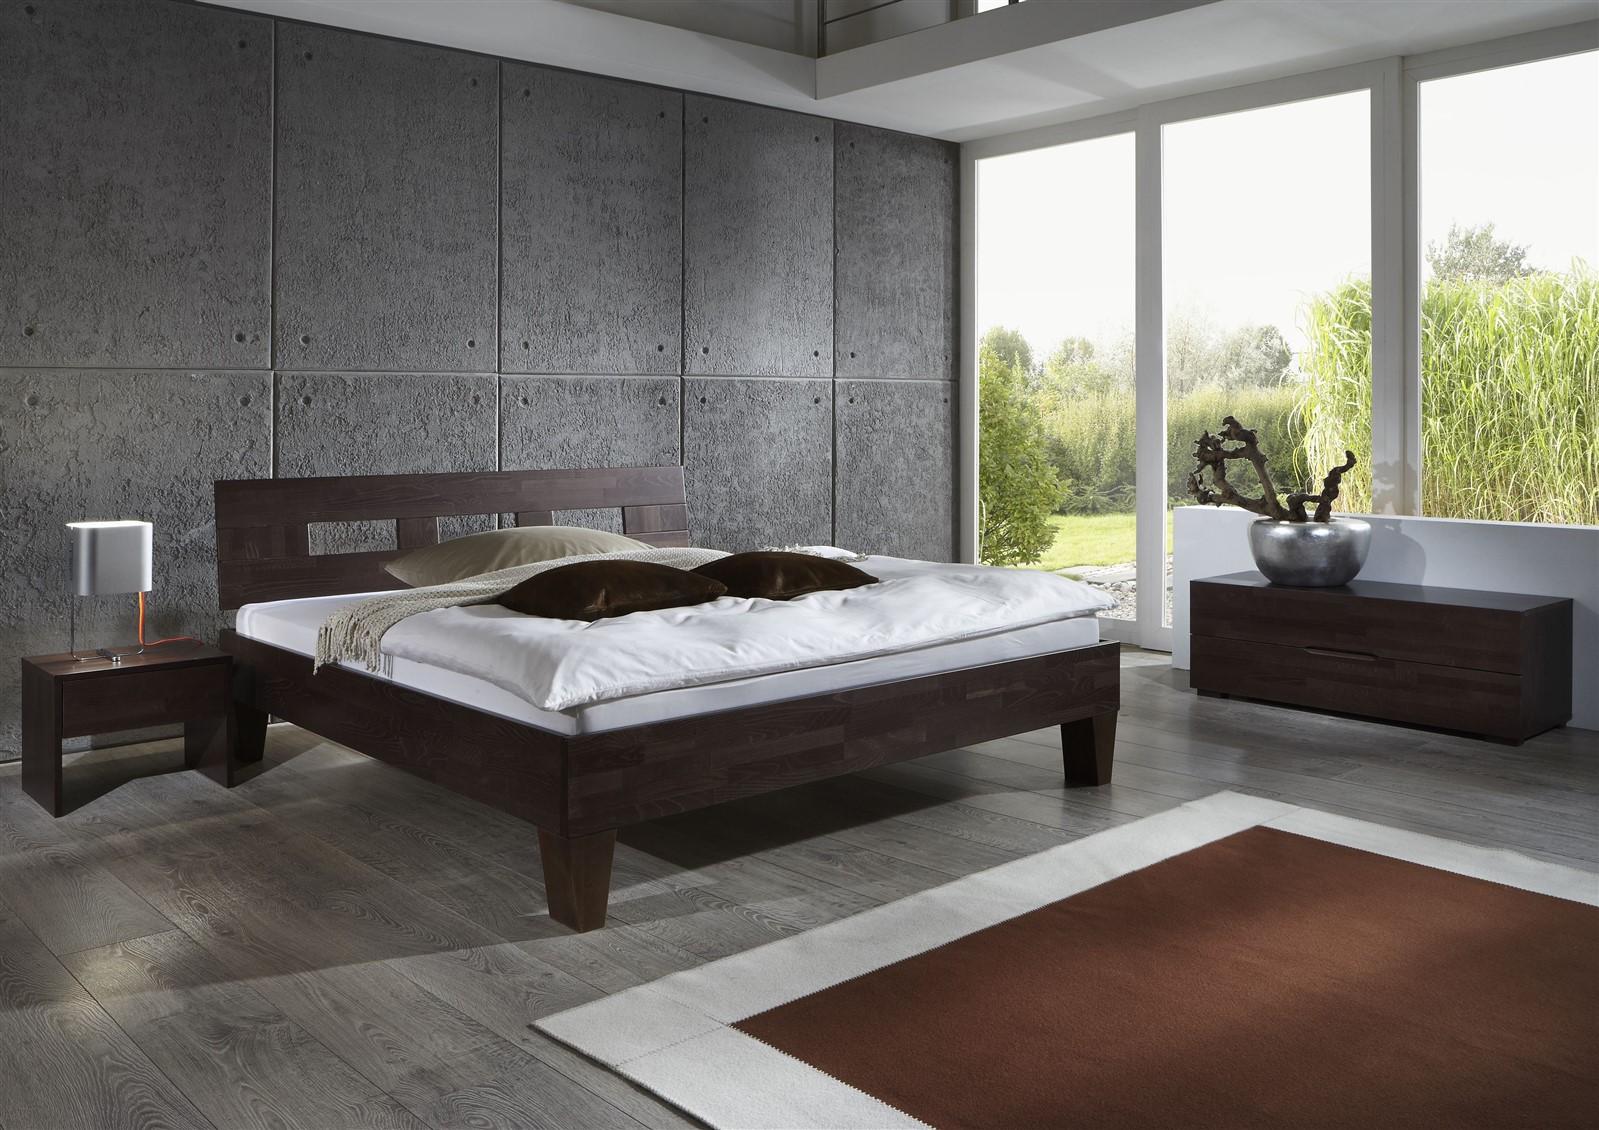 Full Size of Komplettbett 180x220 Bett Wohnzimmer Komplettbett 180x220